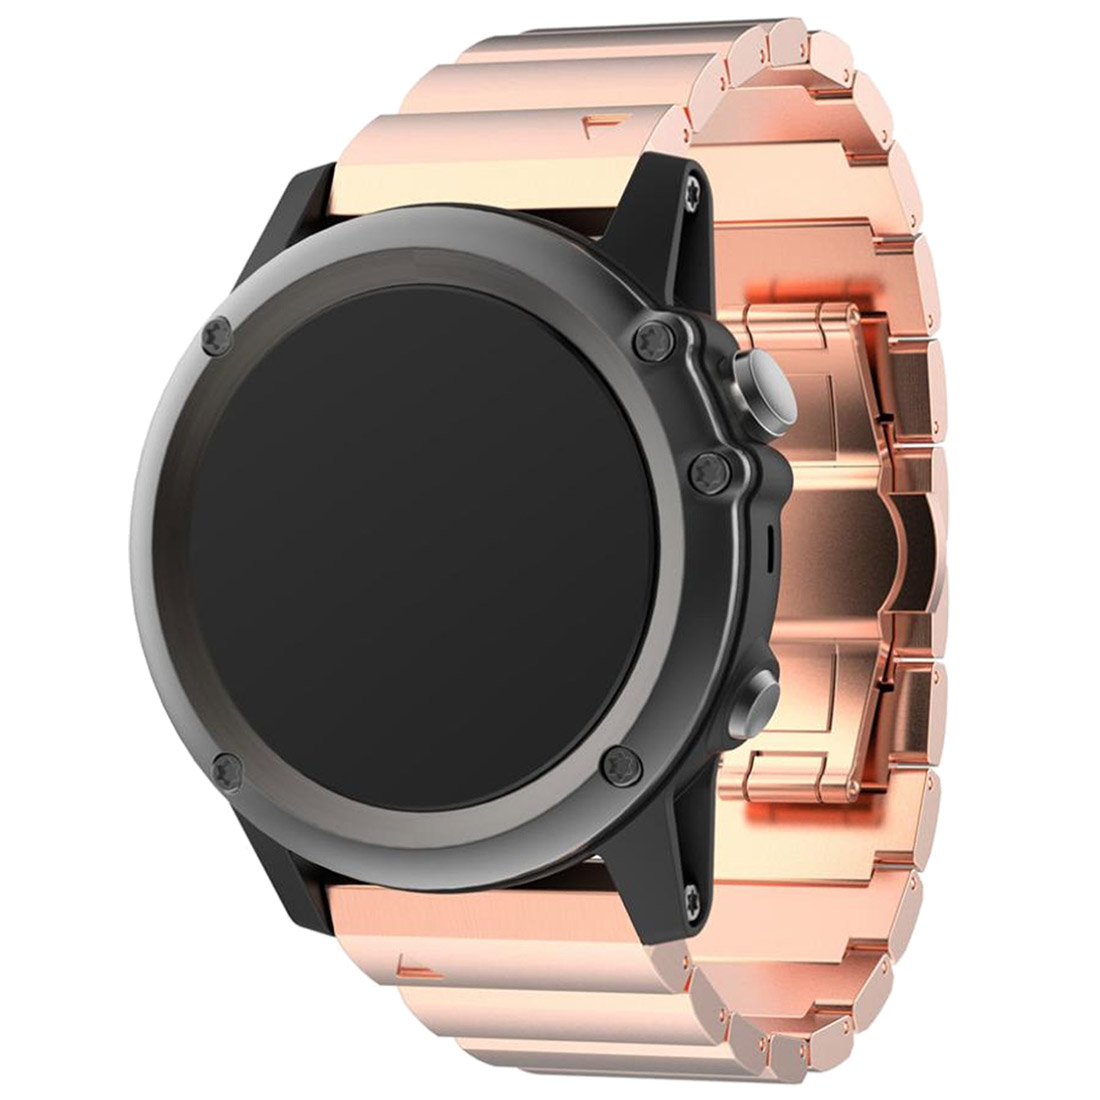 Metal Bracelet Stainless Steel Watch Wrist Band Strap For Garmin Fenix 3 HR Colour Rose Gold